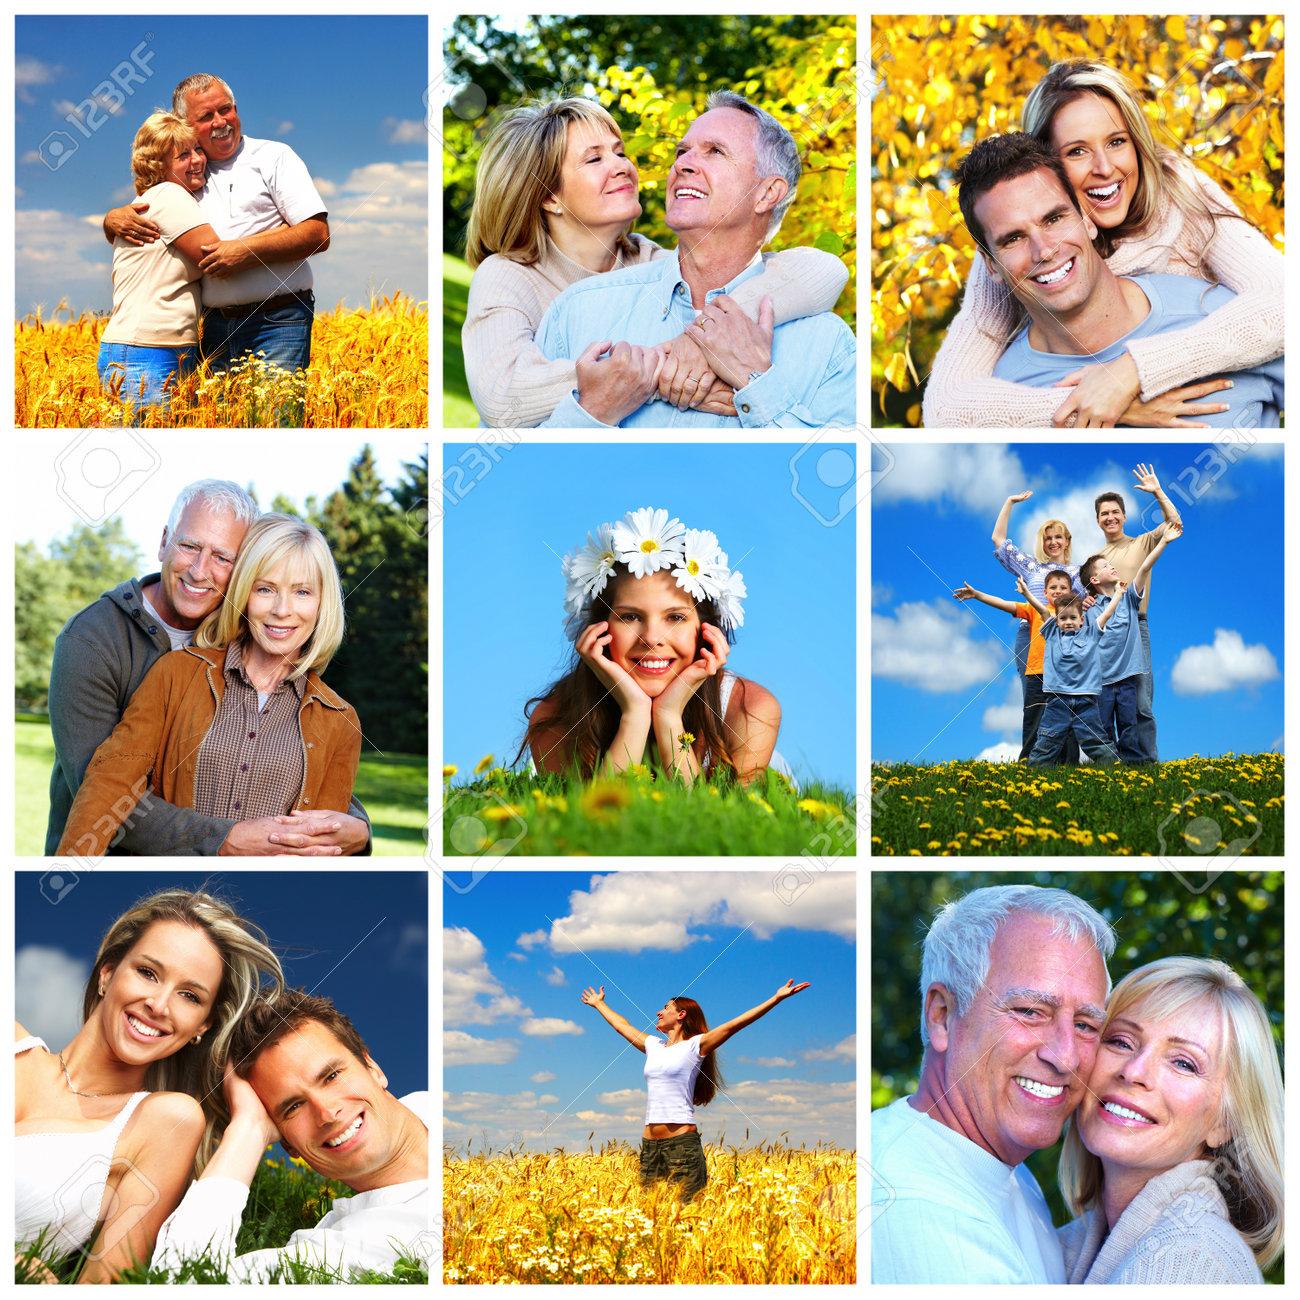 Happy family collage - 19029721